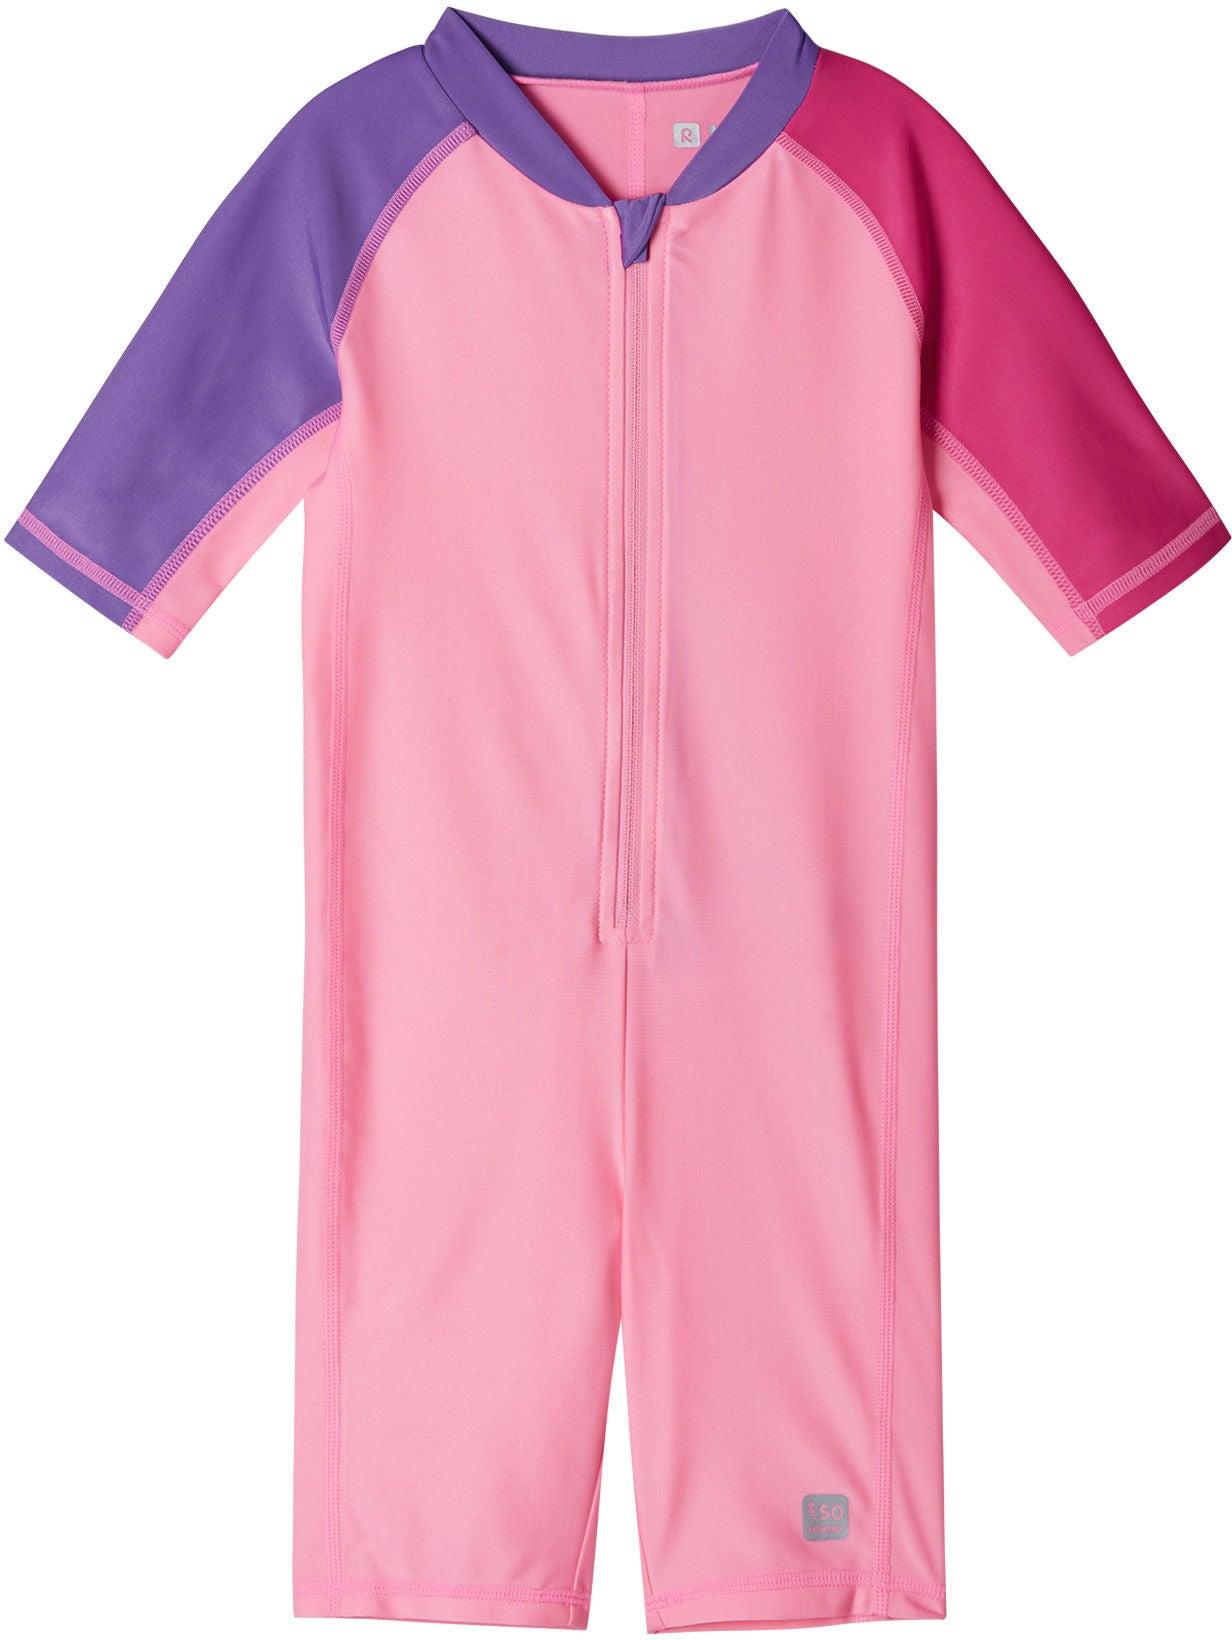 Reima Vesihiisi UV-Dräkt UPF50+, Neon Pink, 104